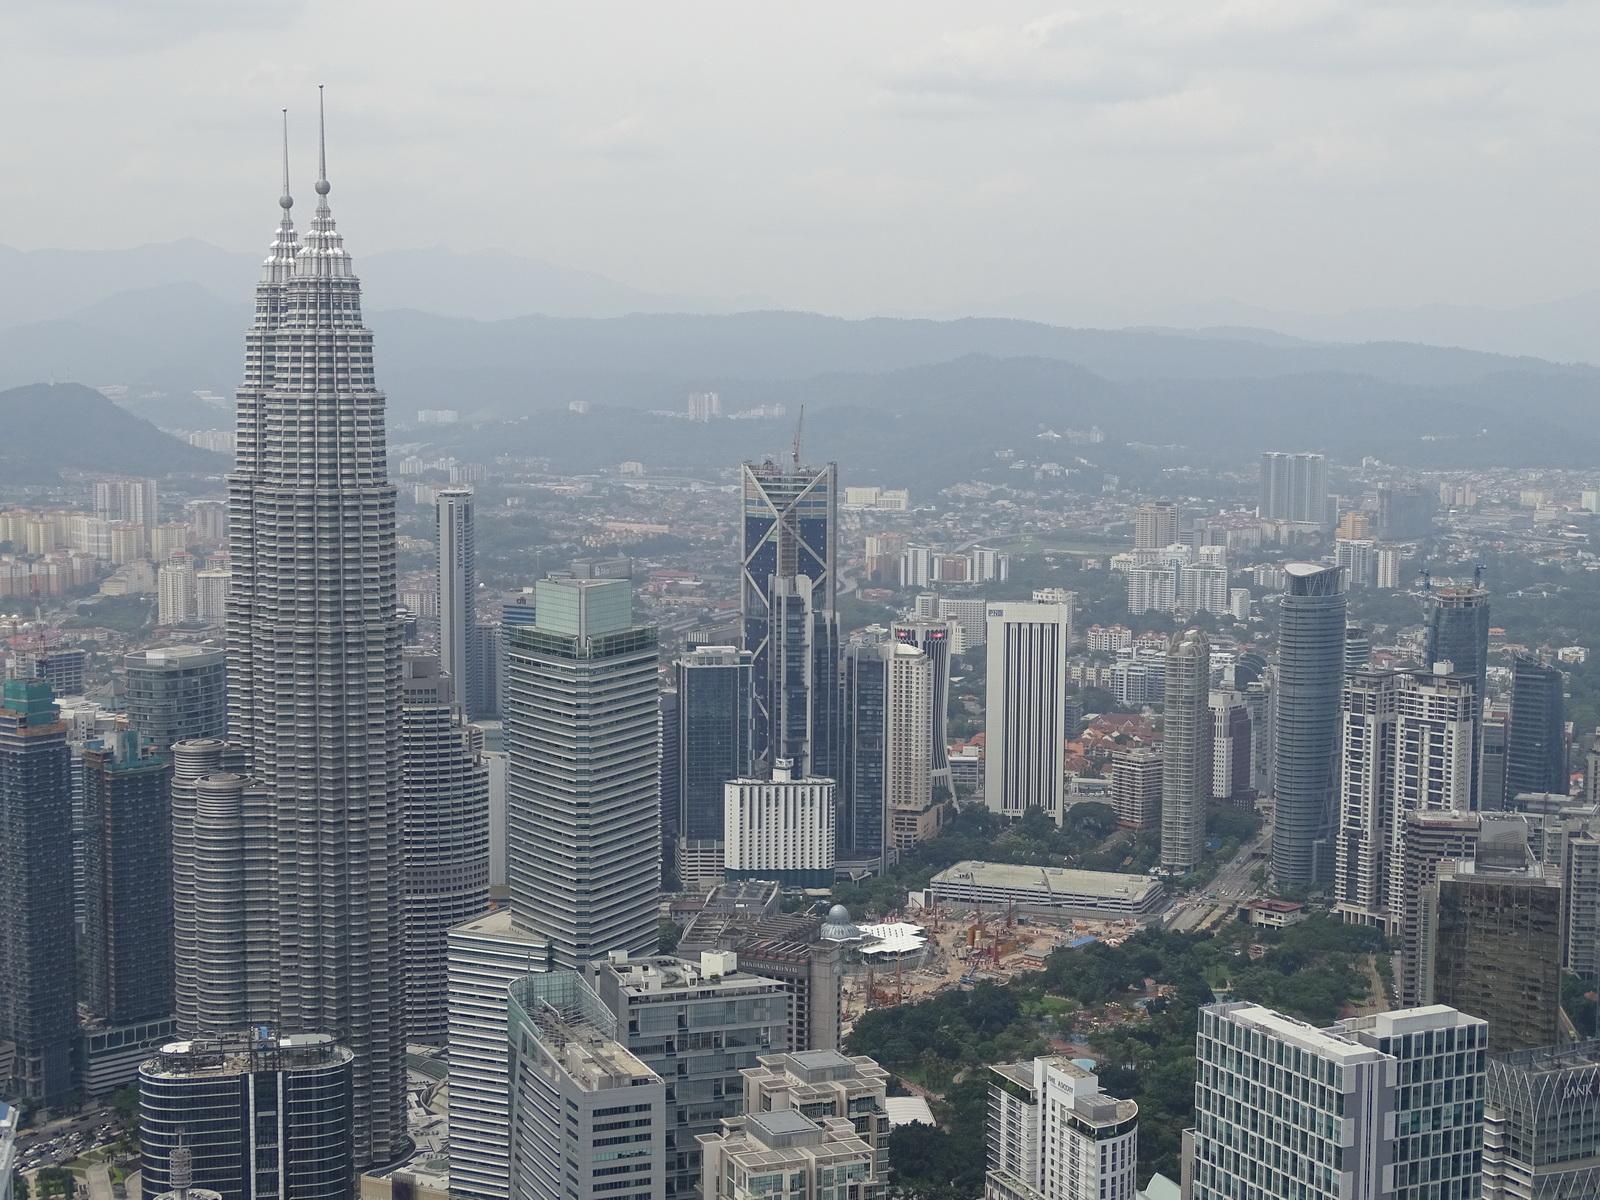 05 KL Tower 23